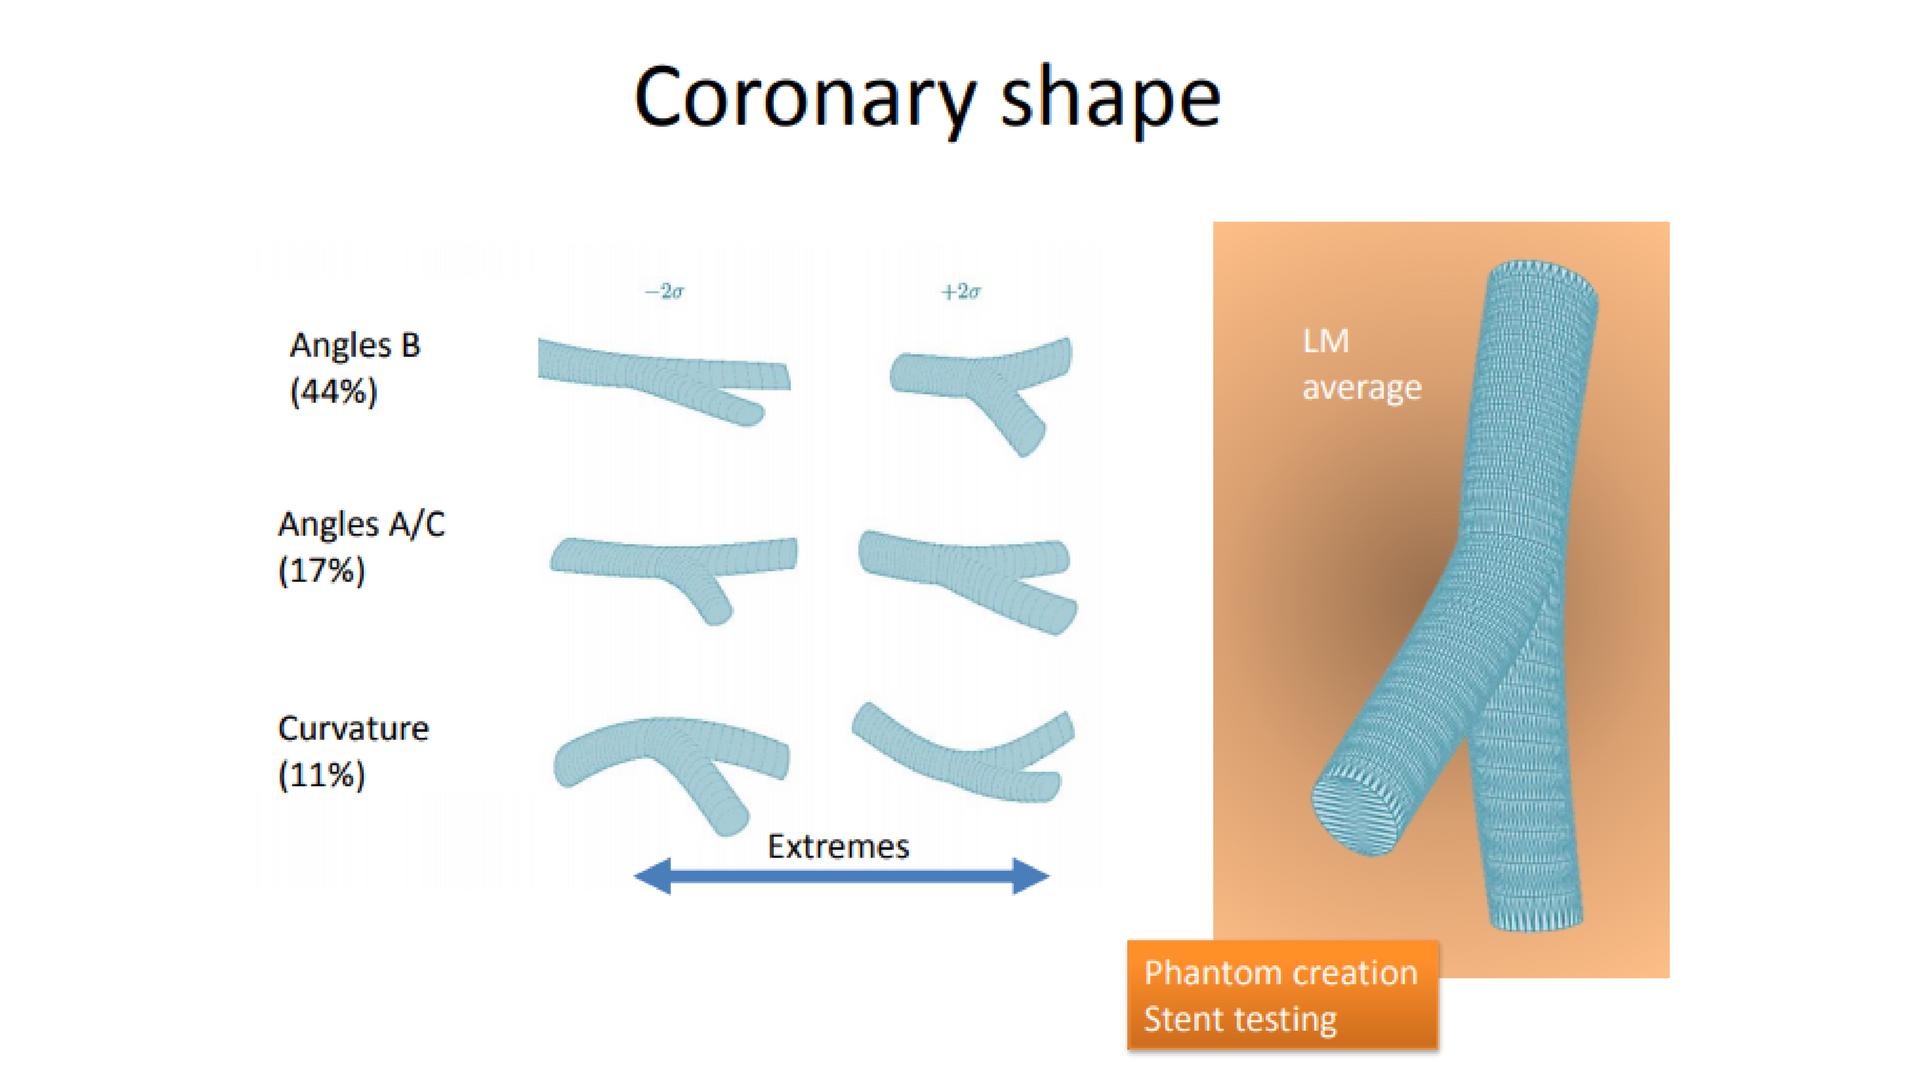 5 - How coronary bifurcation affects flow-209p9hy